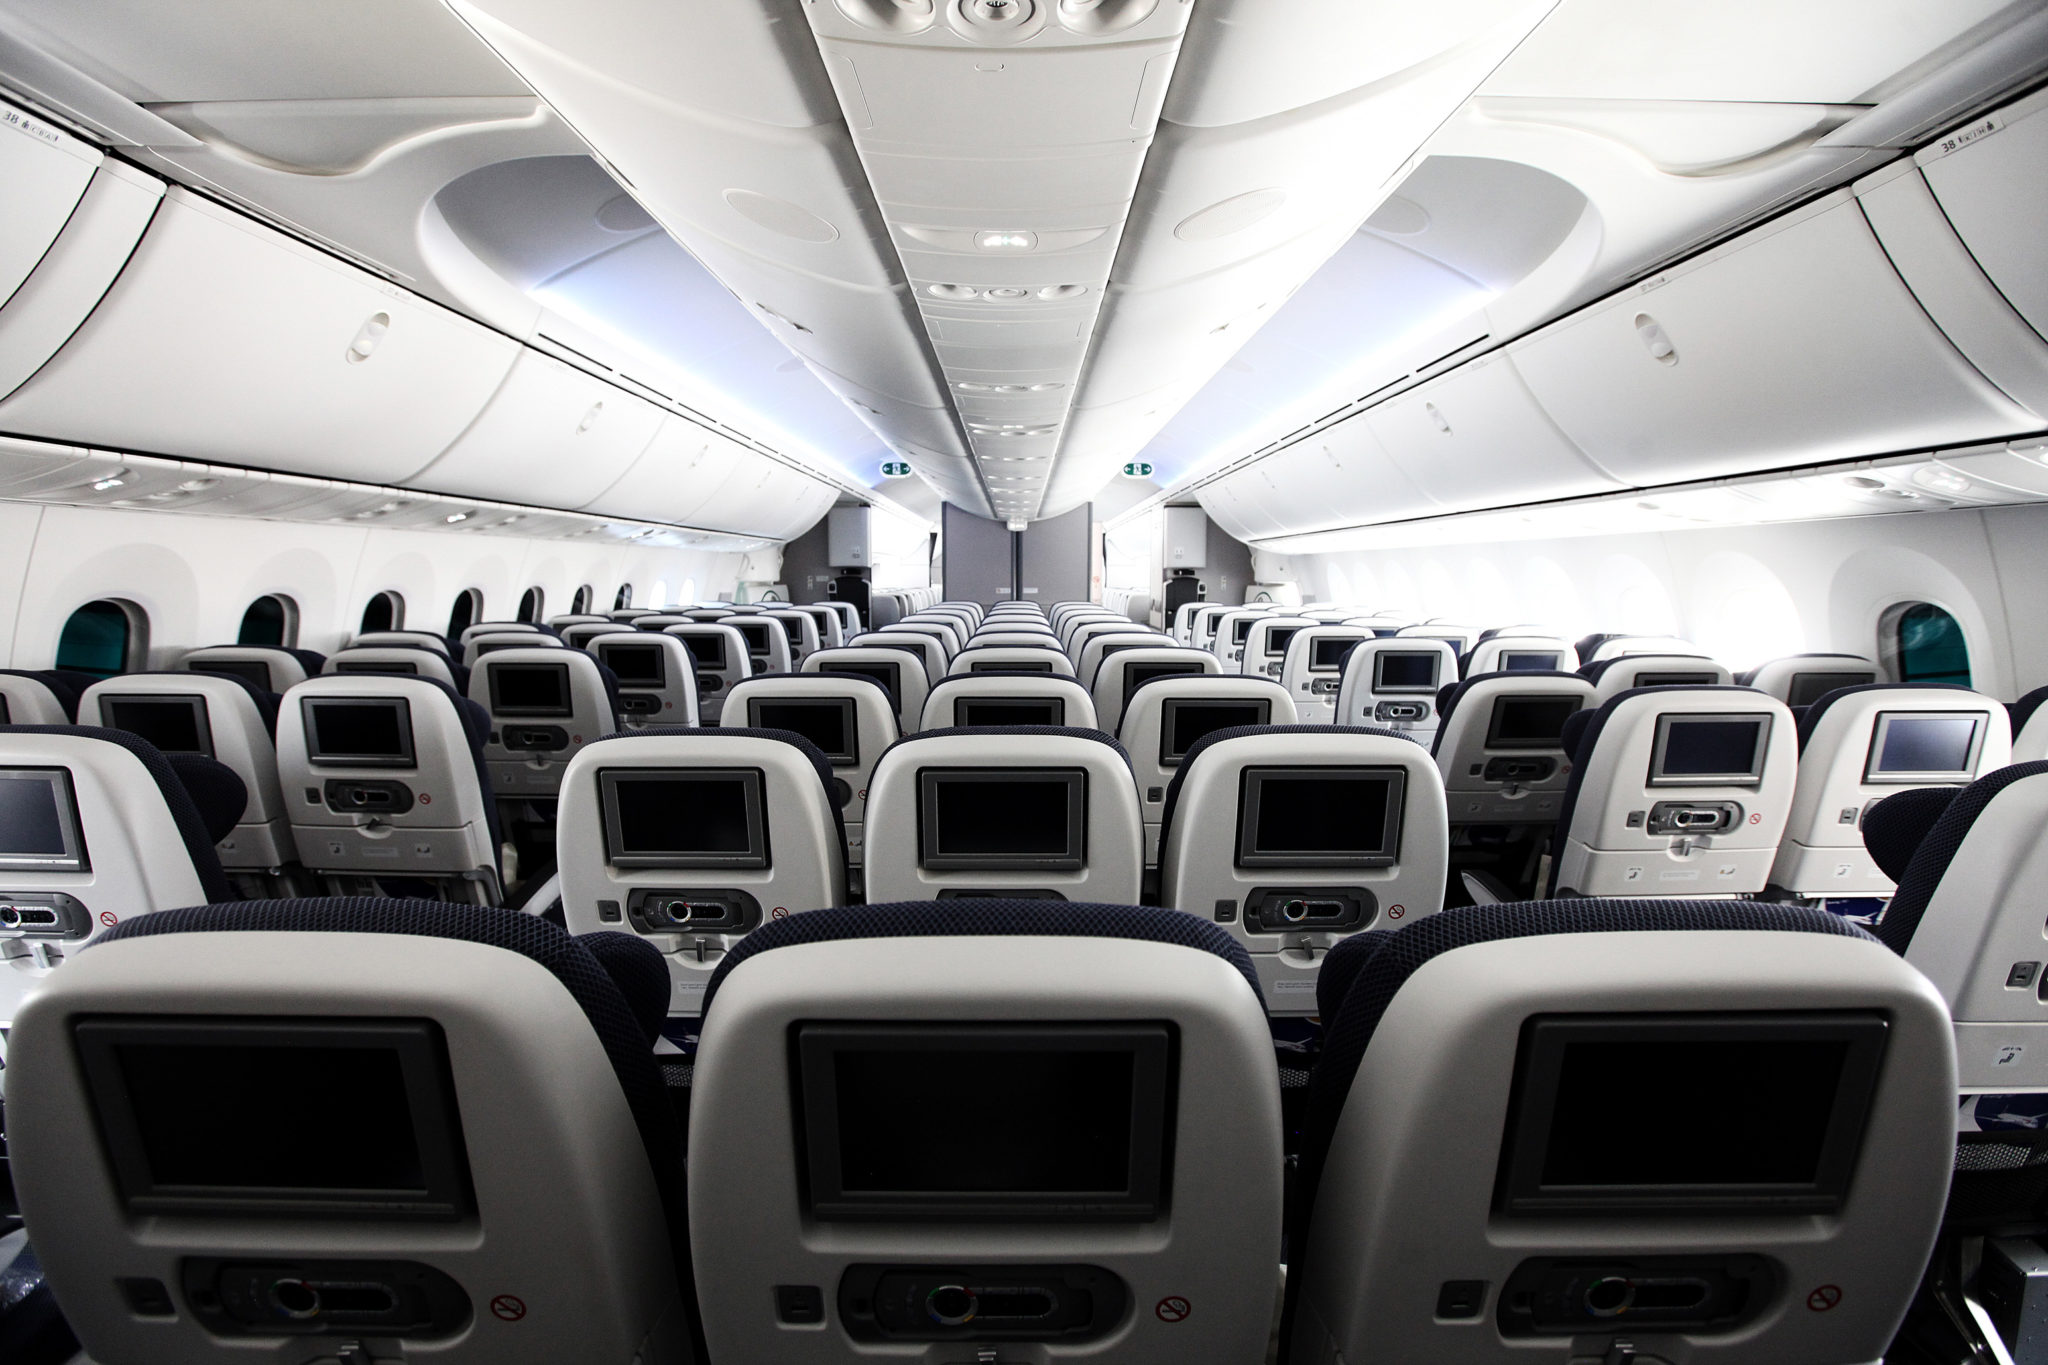 Boeing 787 interior coach viewing gallery - Negative Feedback Prompts British Airways To Widen Seats For 787 9 Runway Girlrunway Girl